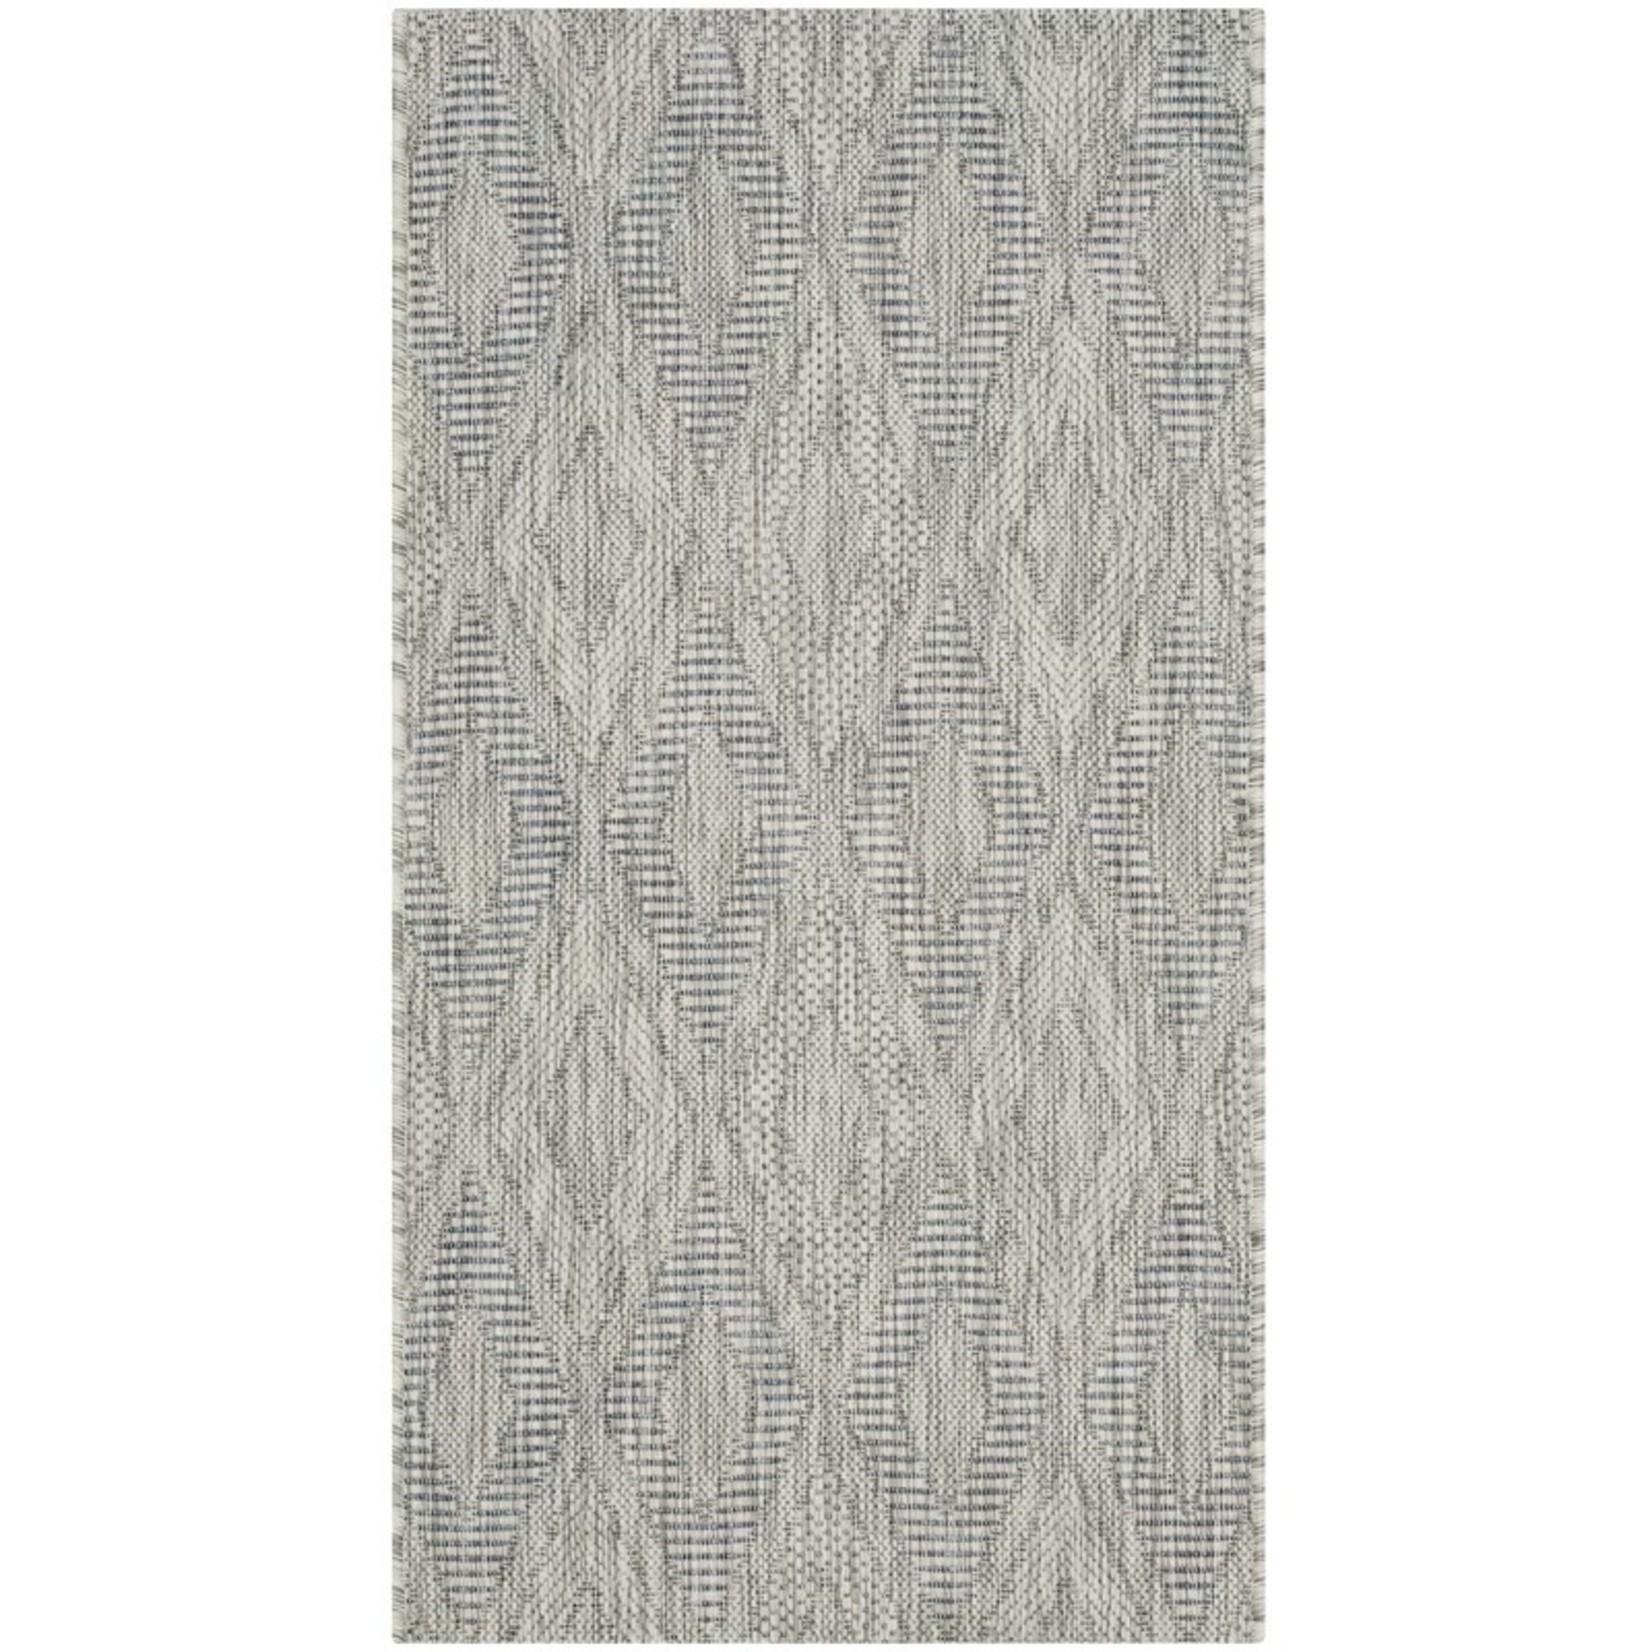 *2'3 x 6'7 - Davy Geometric Gray/Wheat Indoor / Outdoor Area Rug